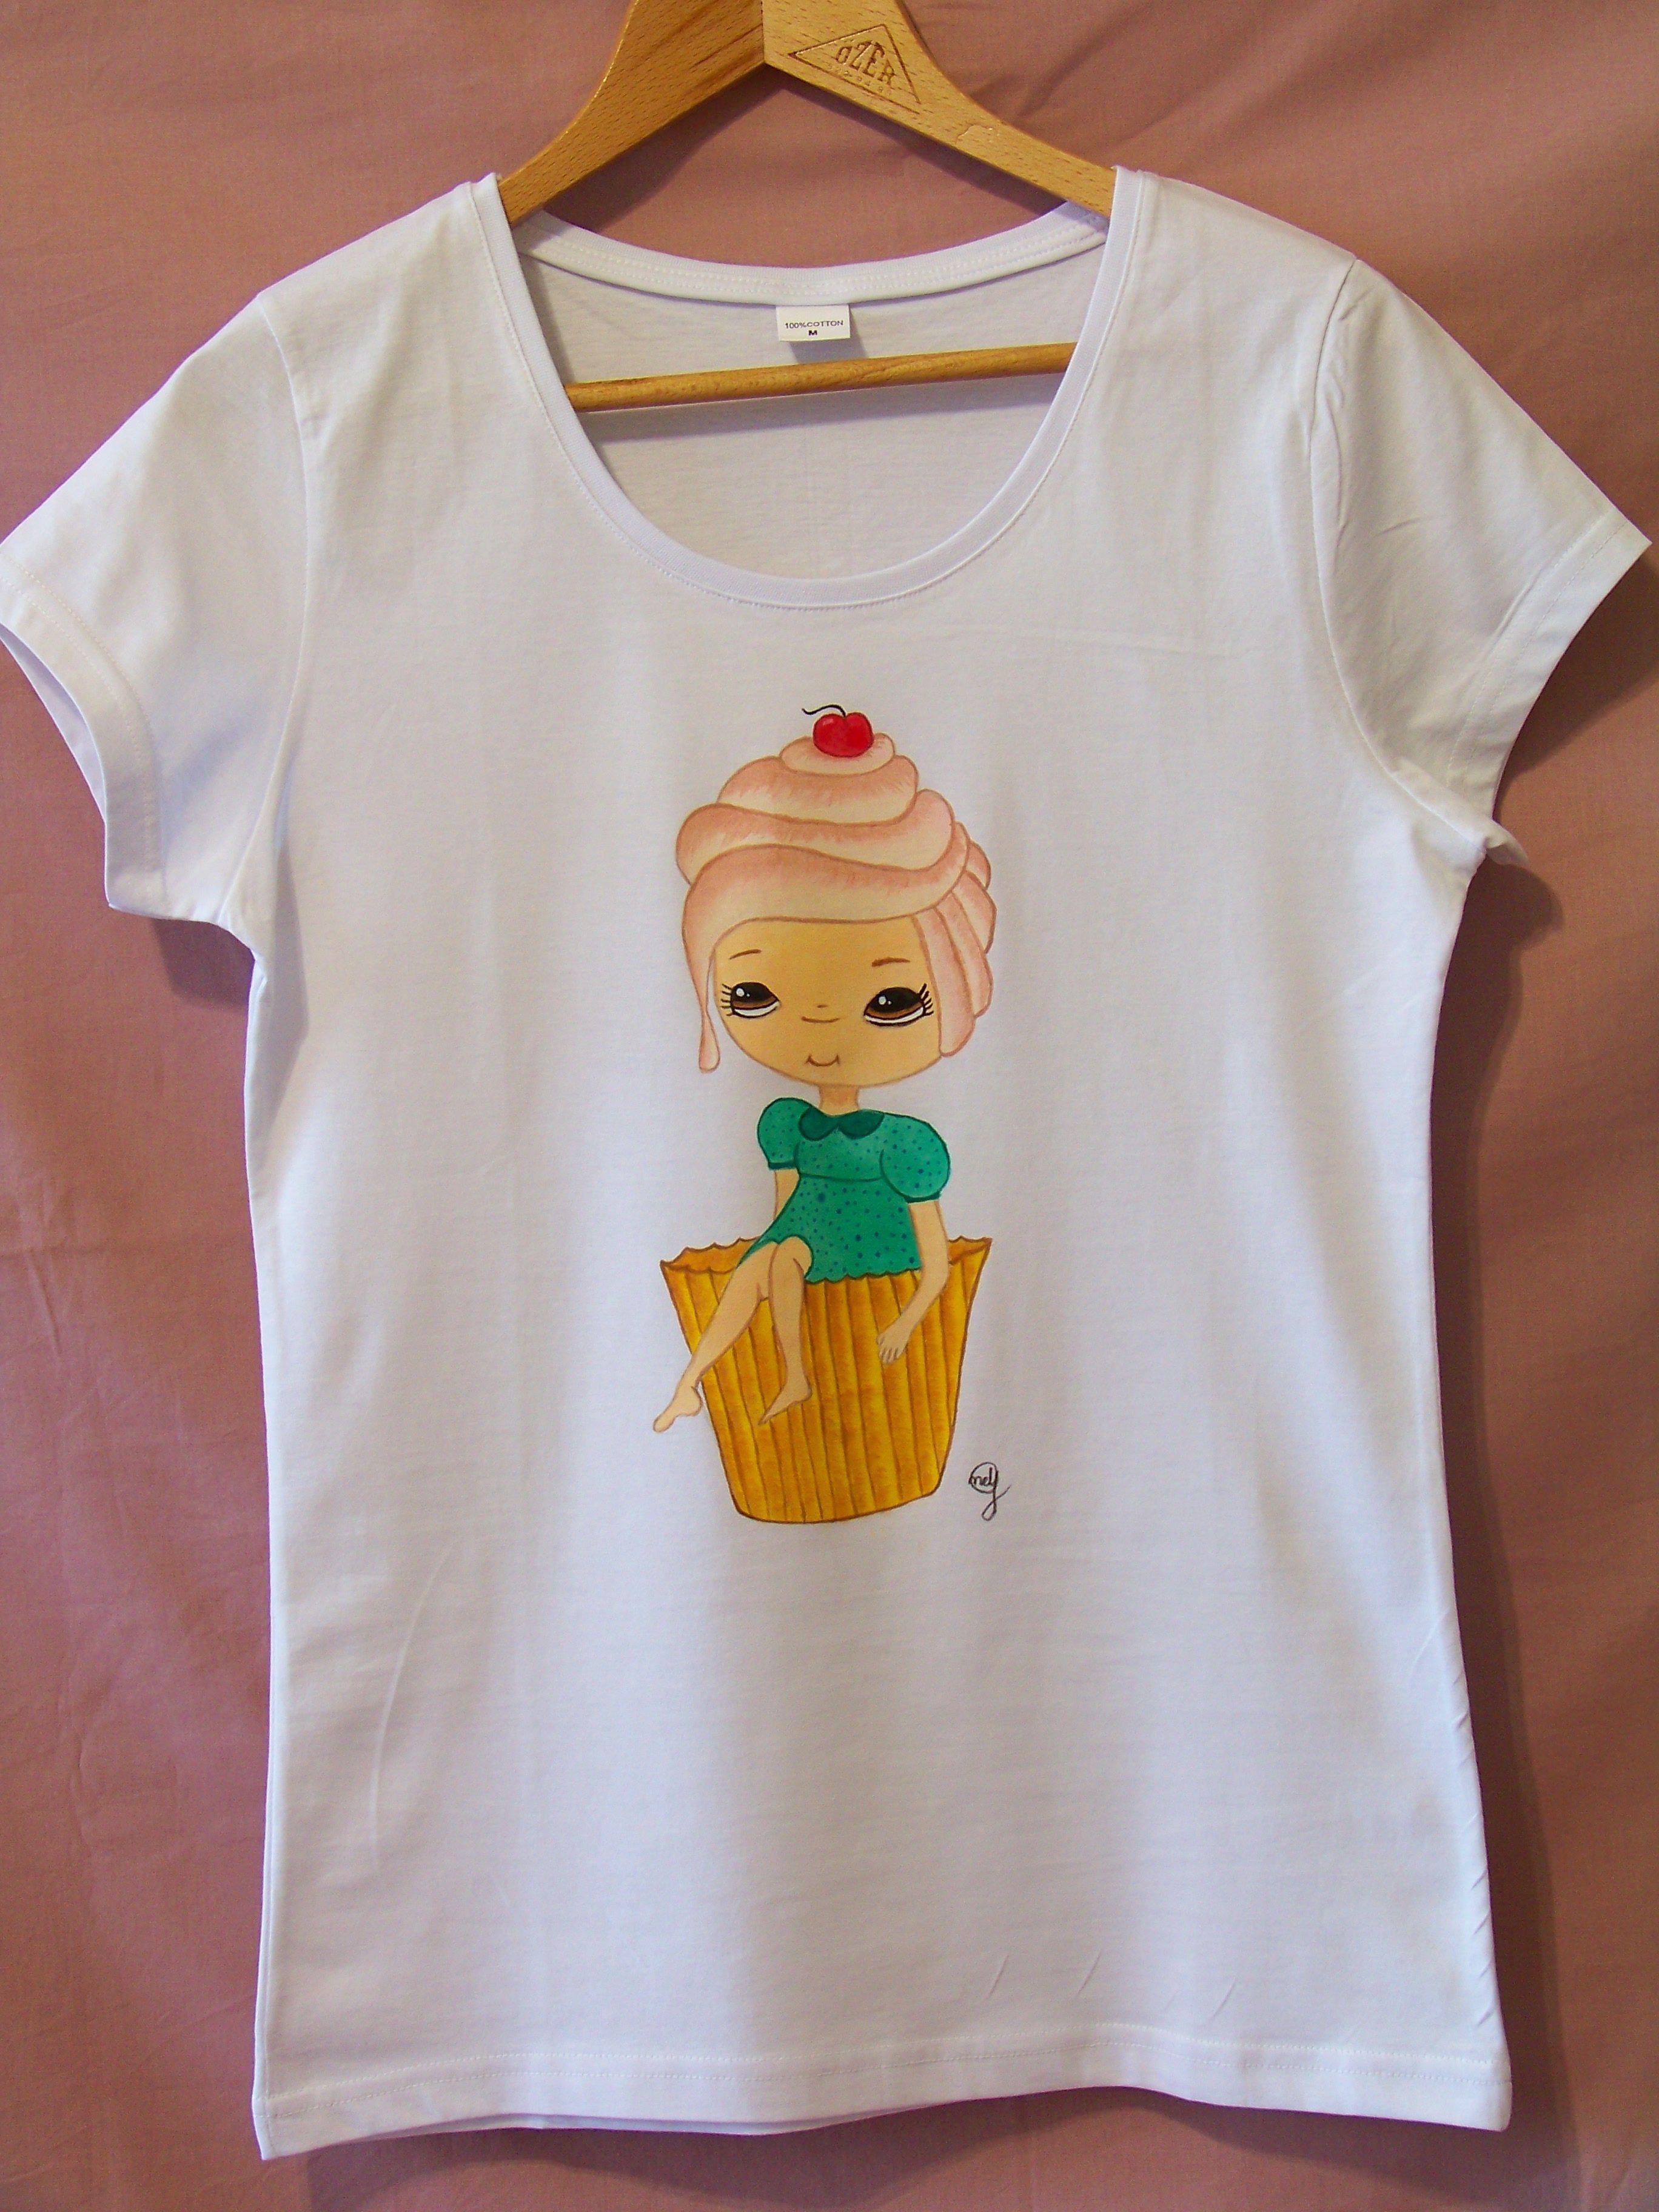 T shirt handmade design - Cupcake Girl Thelollipopdesign Handmade Design Accessories Customdesign